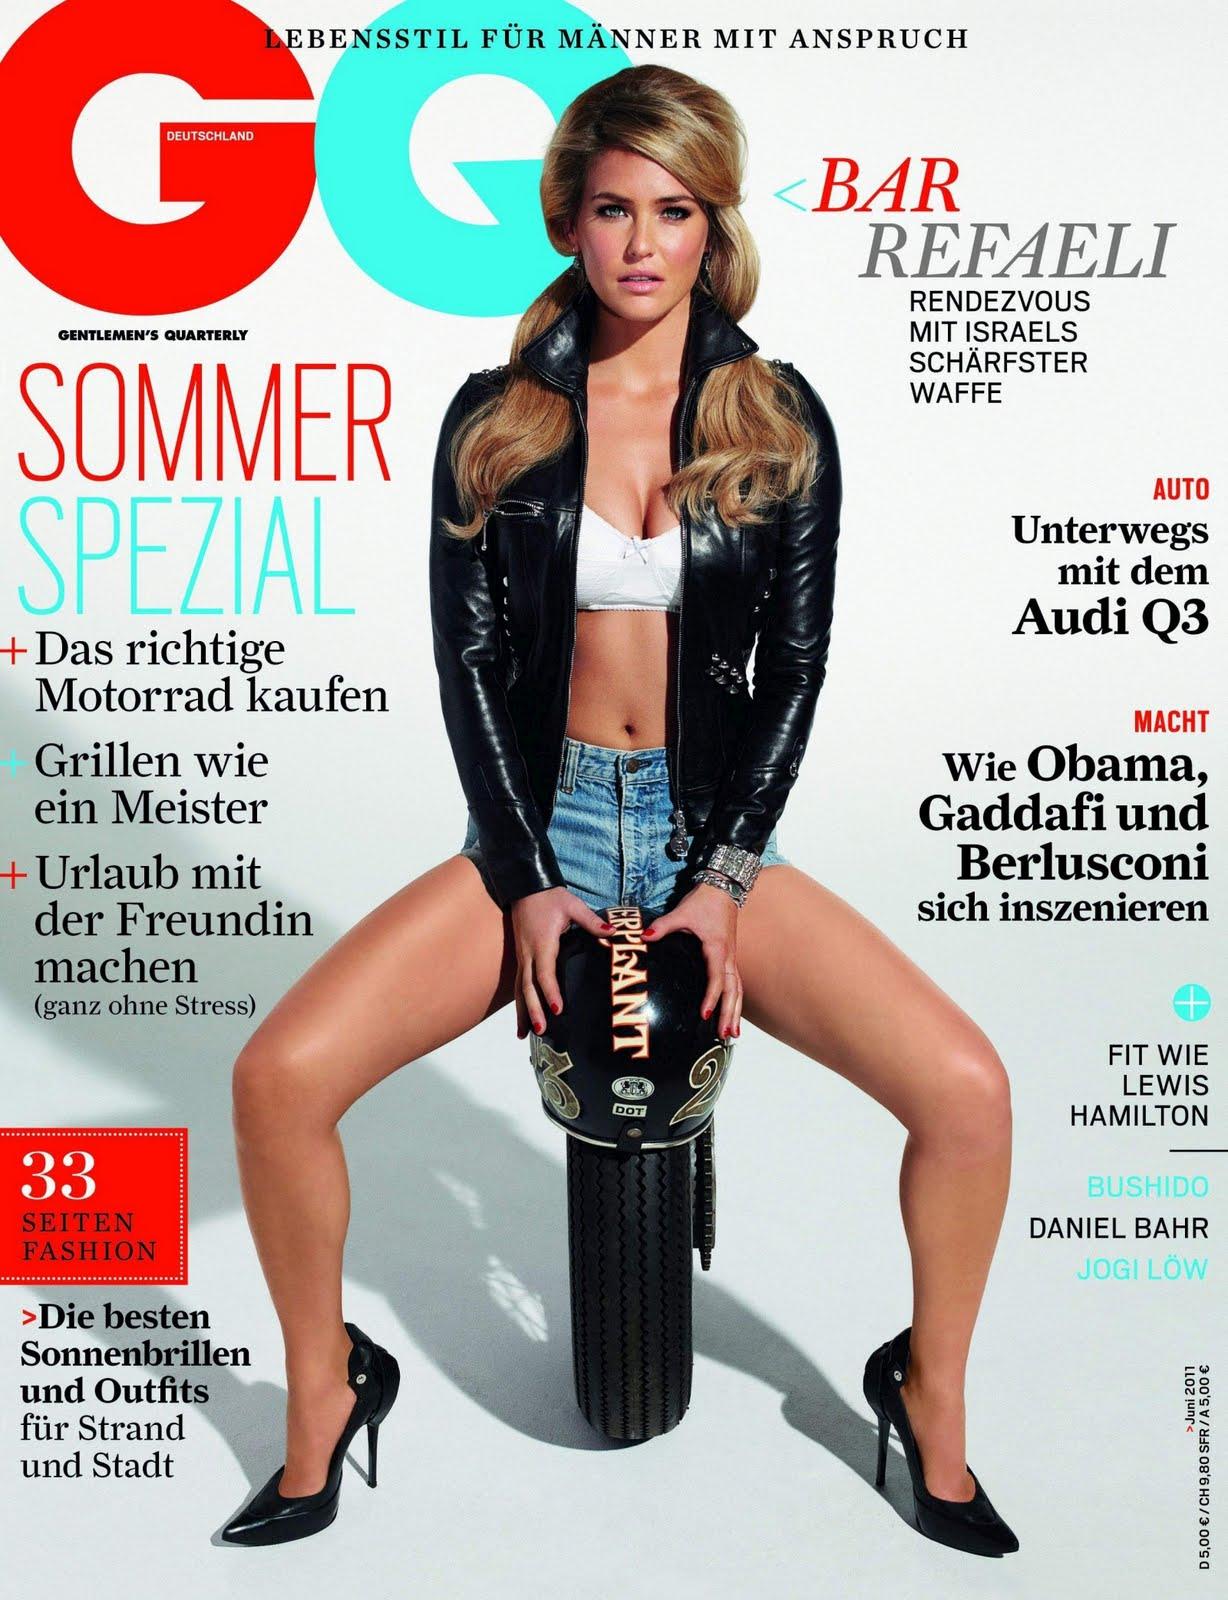 http://3.bp.blogspot.com/-dYC9PmwgFA4/TdqC0o-o38I/AAAAAAAAPFk/Bie-qYtEuNI/s1600/Bar+Refaeli+GQ+Germany.jpg